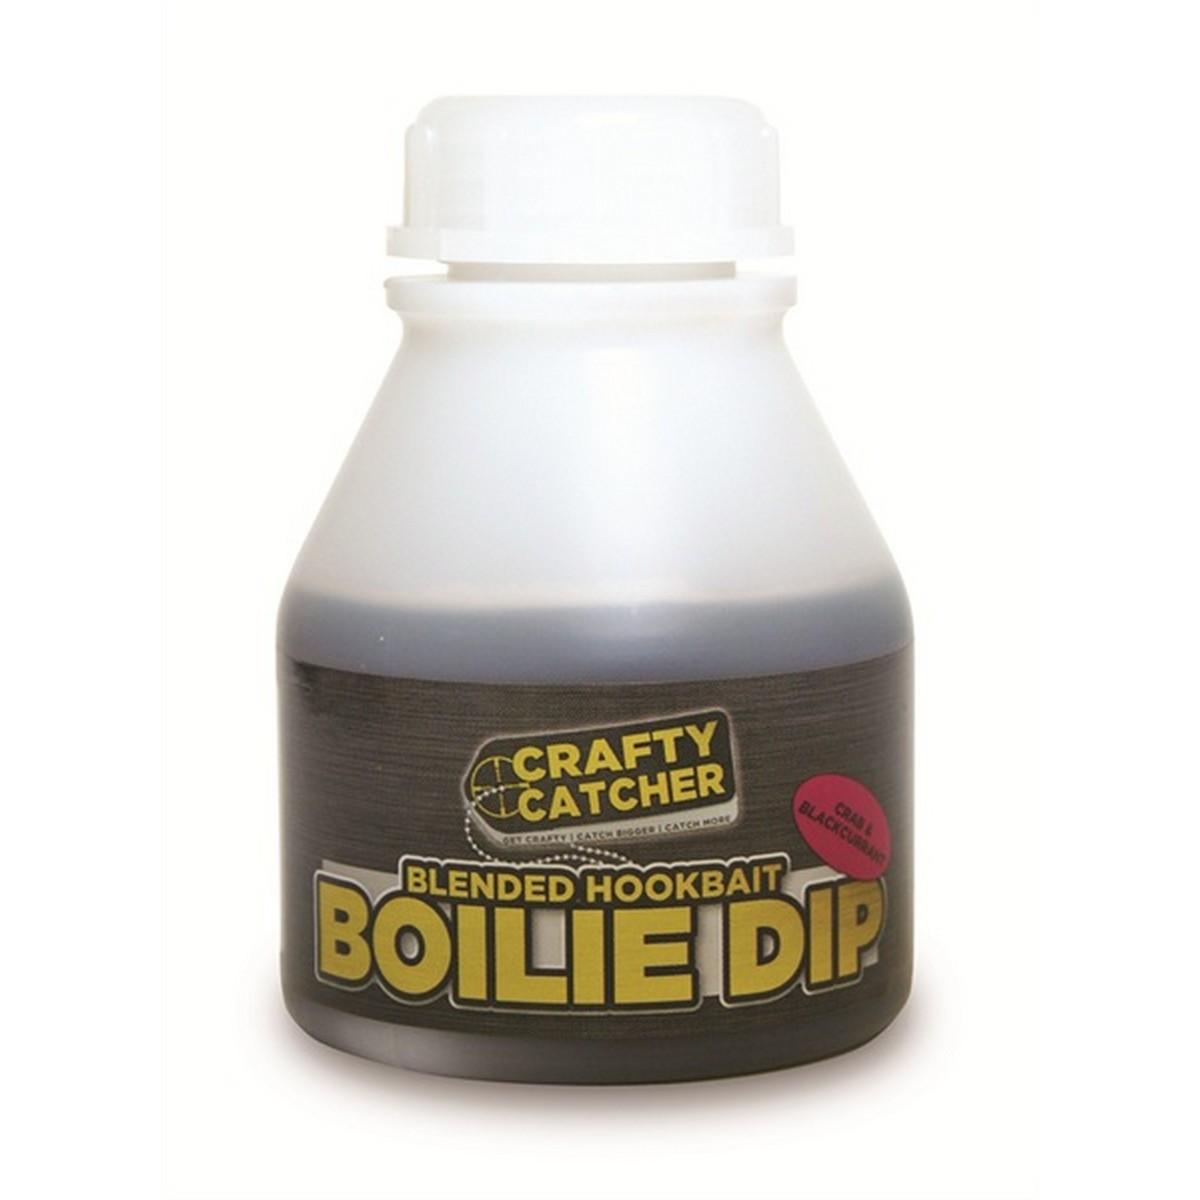 Дип Crafty Catcher Blended Hookbait Boilie Dip